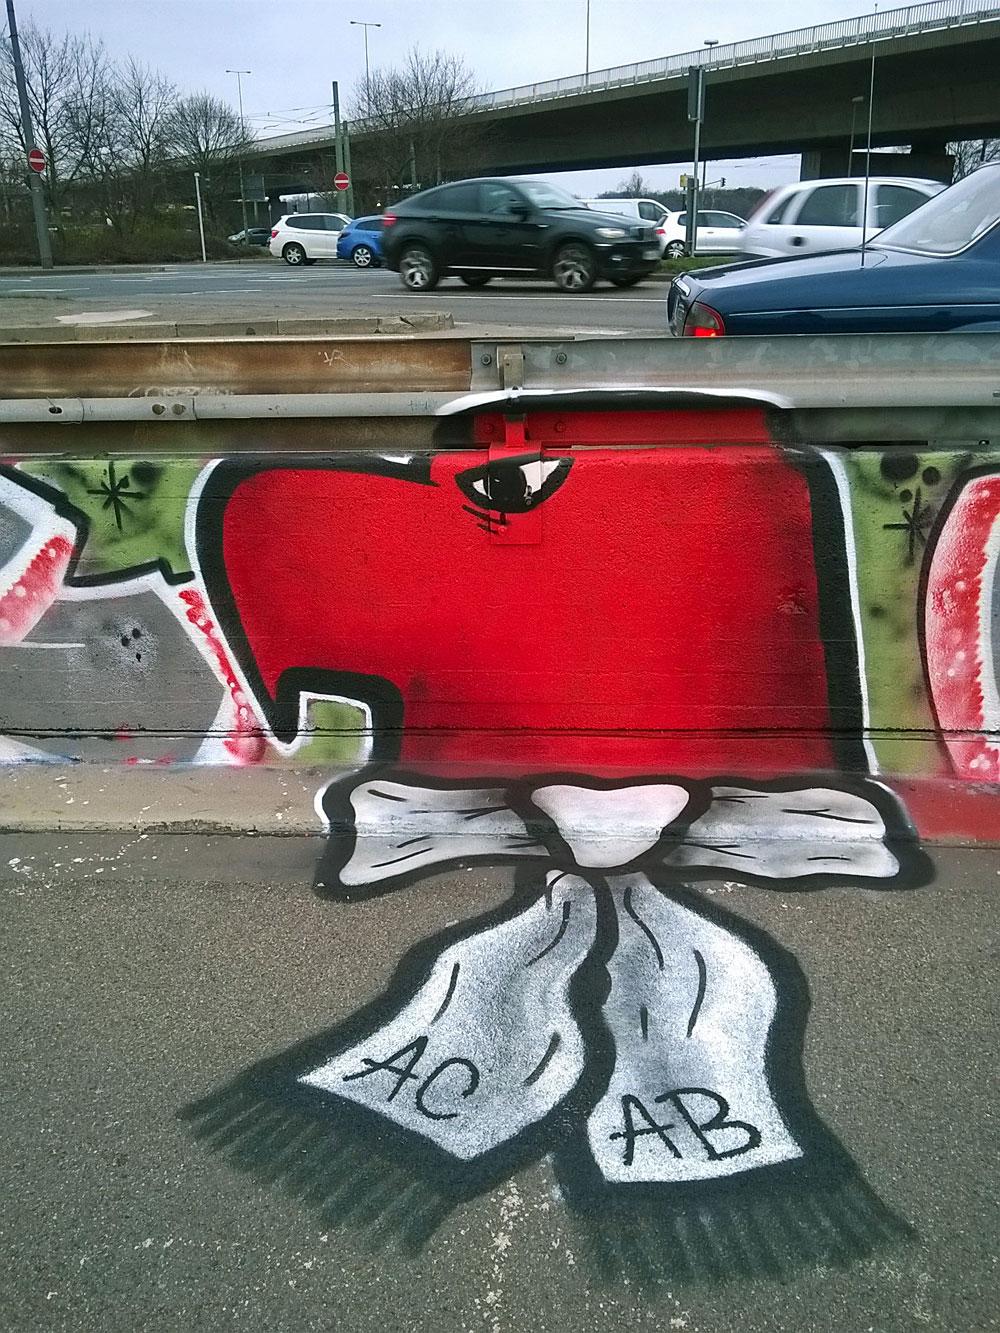 attila-adler-eintracht-graffiti-hall-of-fame-frankfurt-ratsweg-unterfuehrung